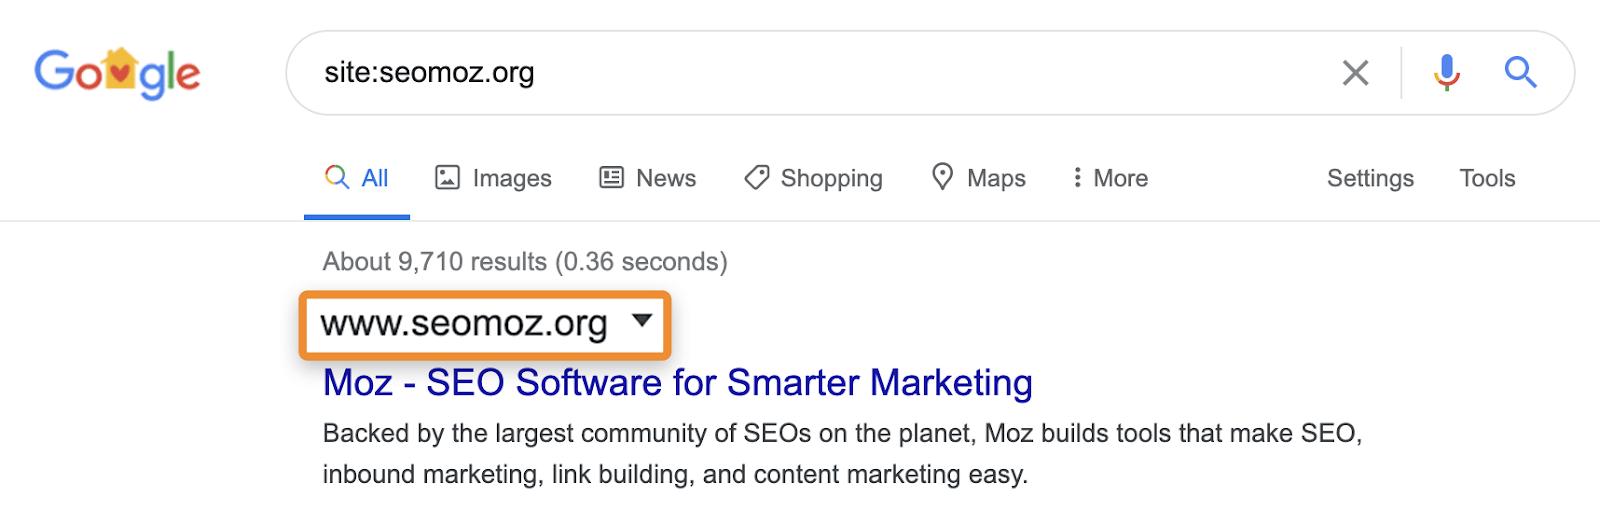 seomoz site search serp